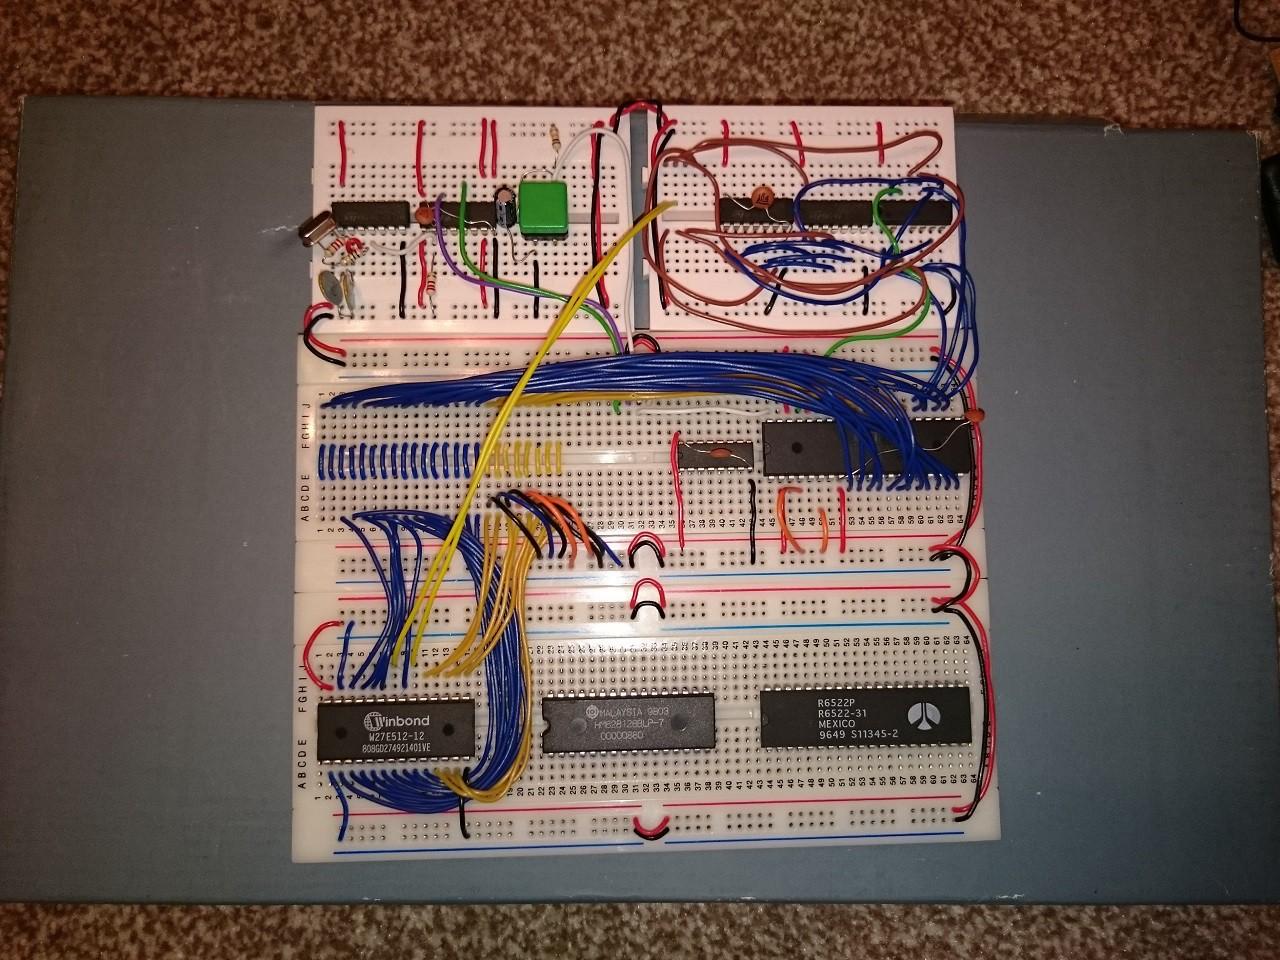 Project | 6502 Homebrew Computer | Hackaday io